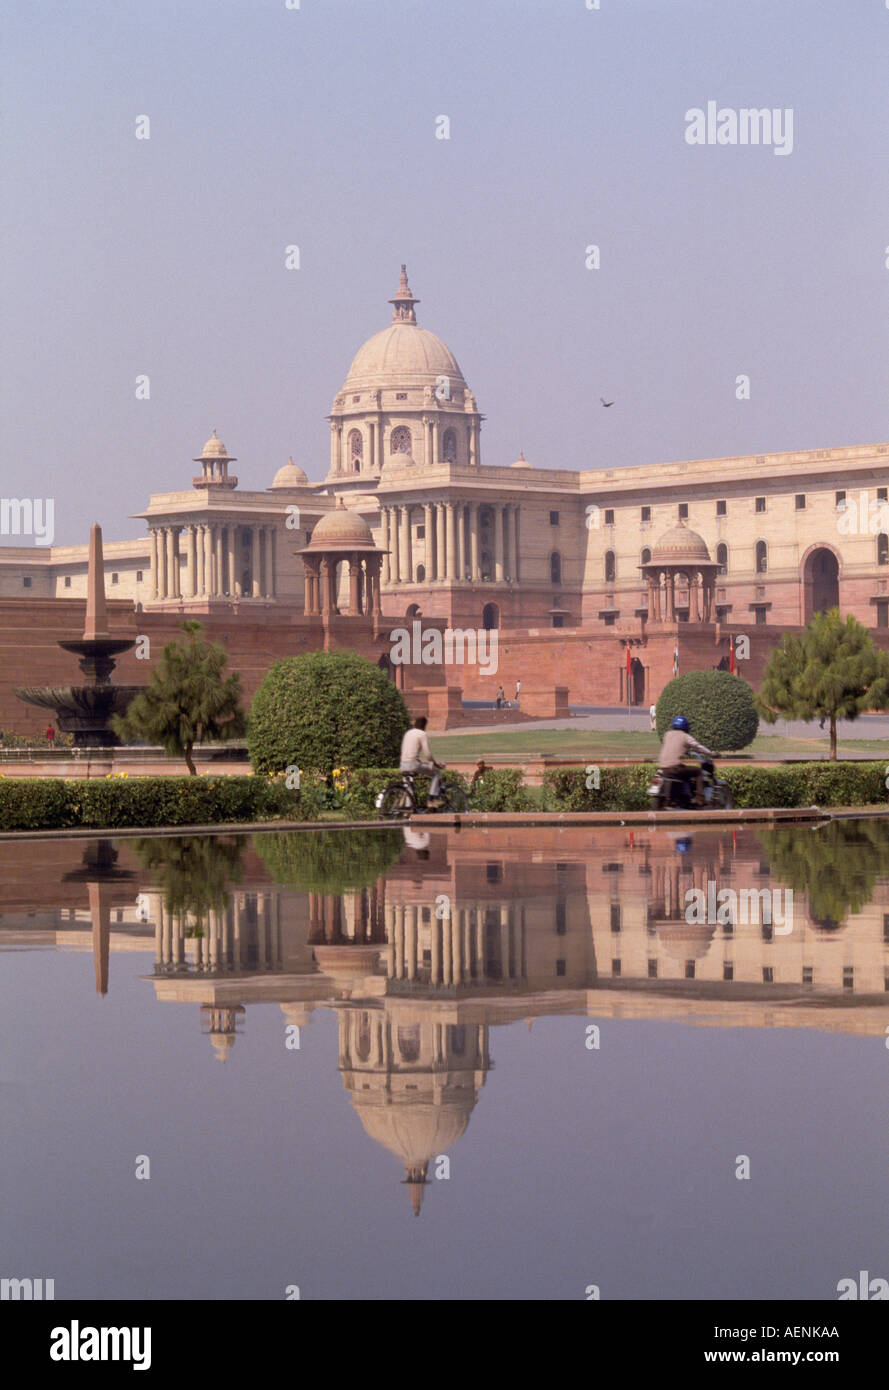 Neu Delhi, Parlament, Sitz des Premierminister - Stock Image